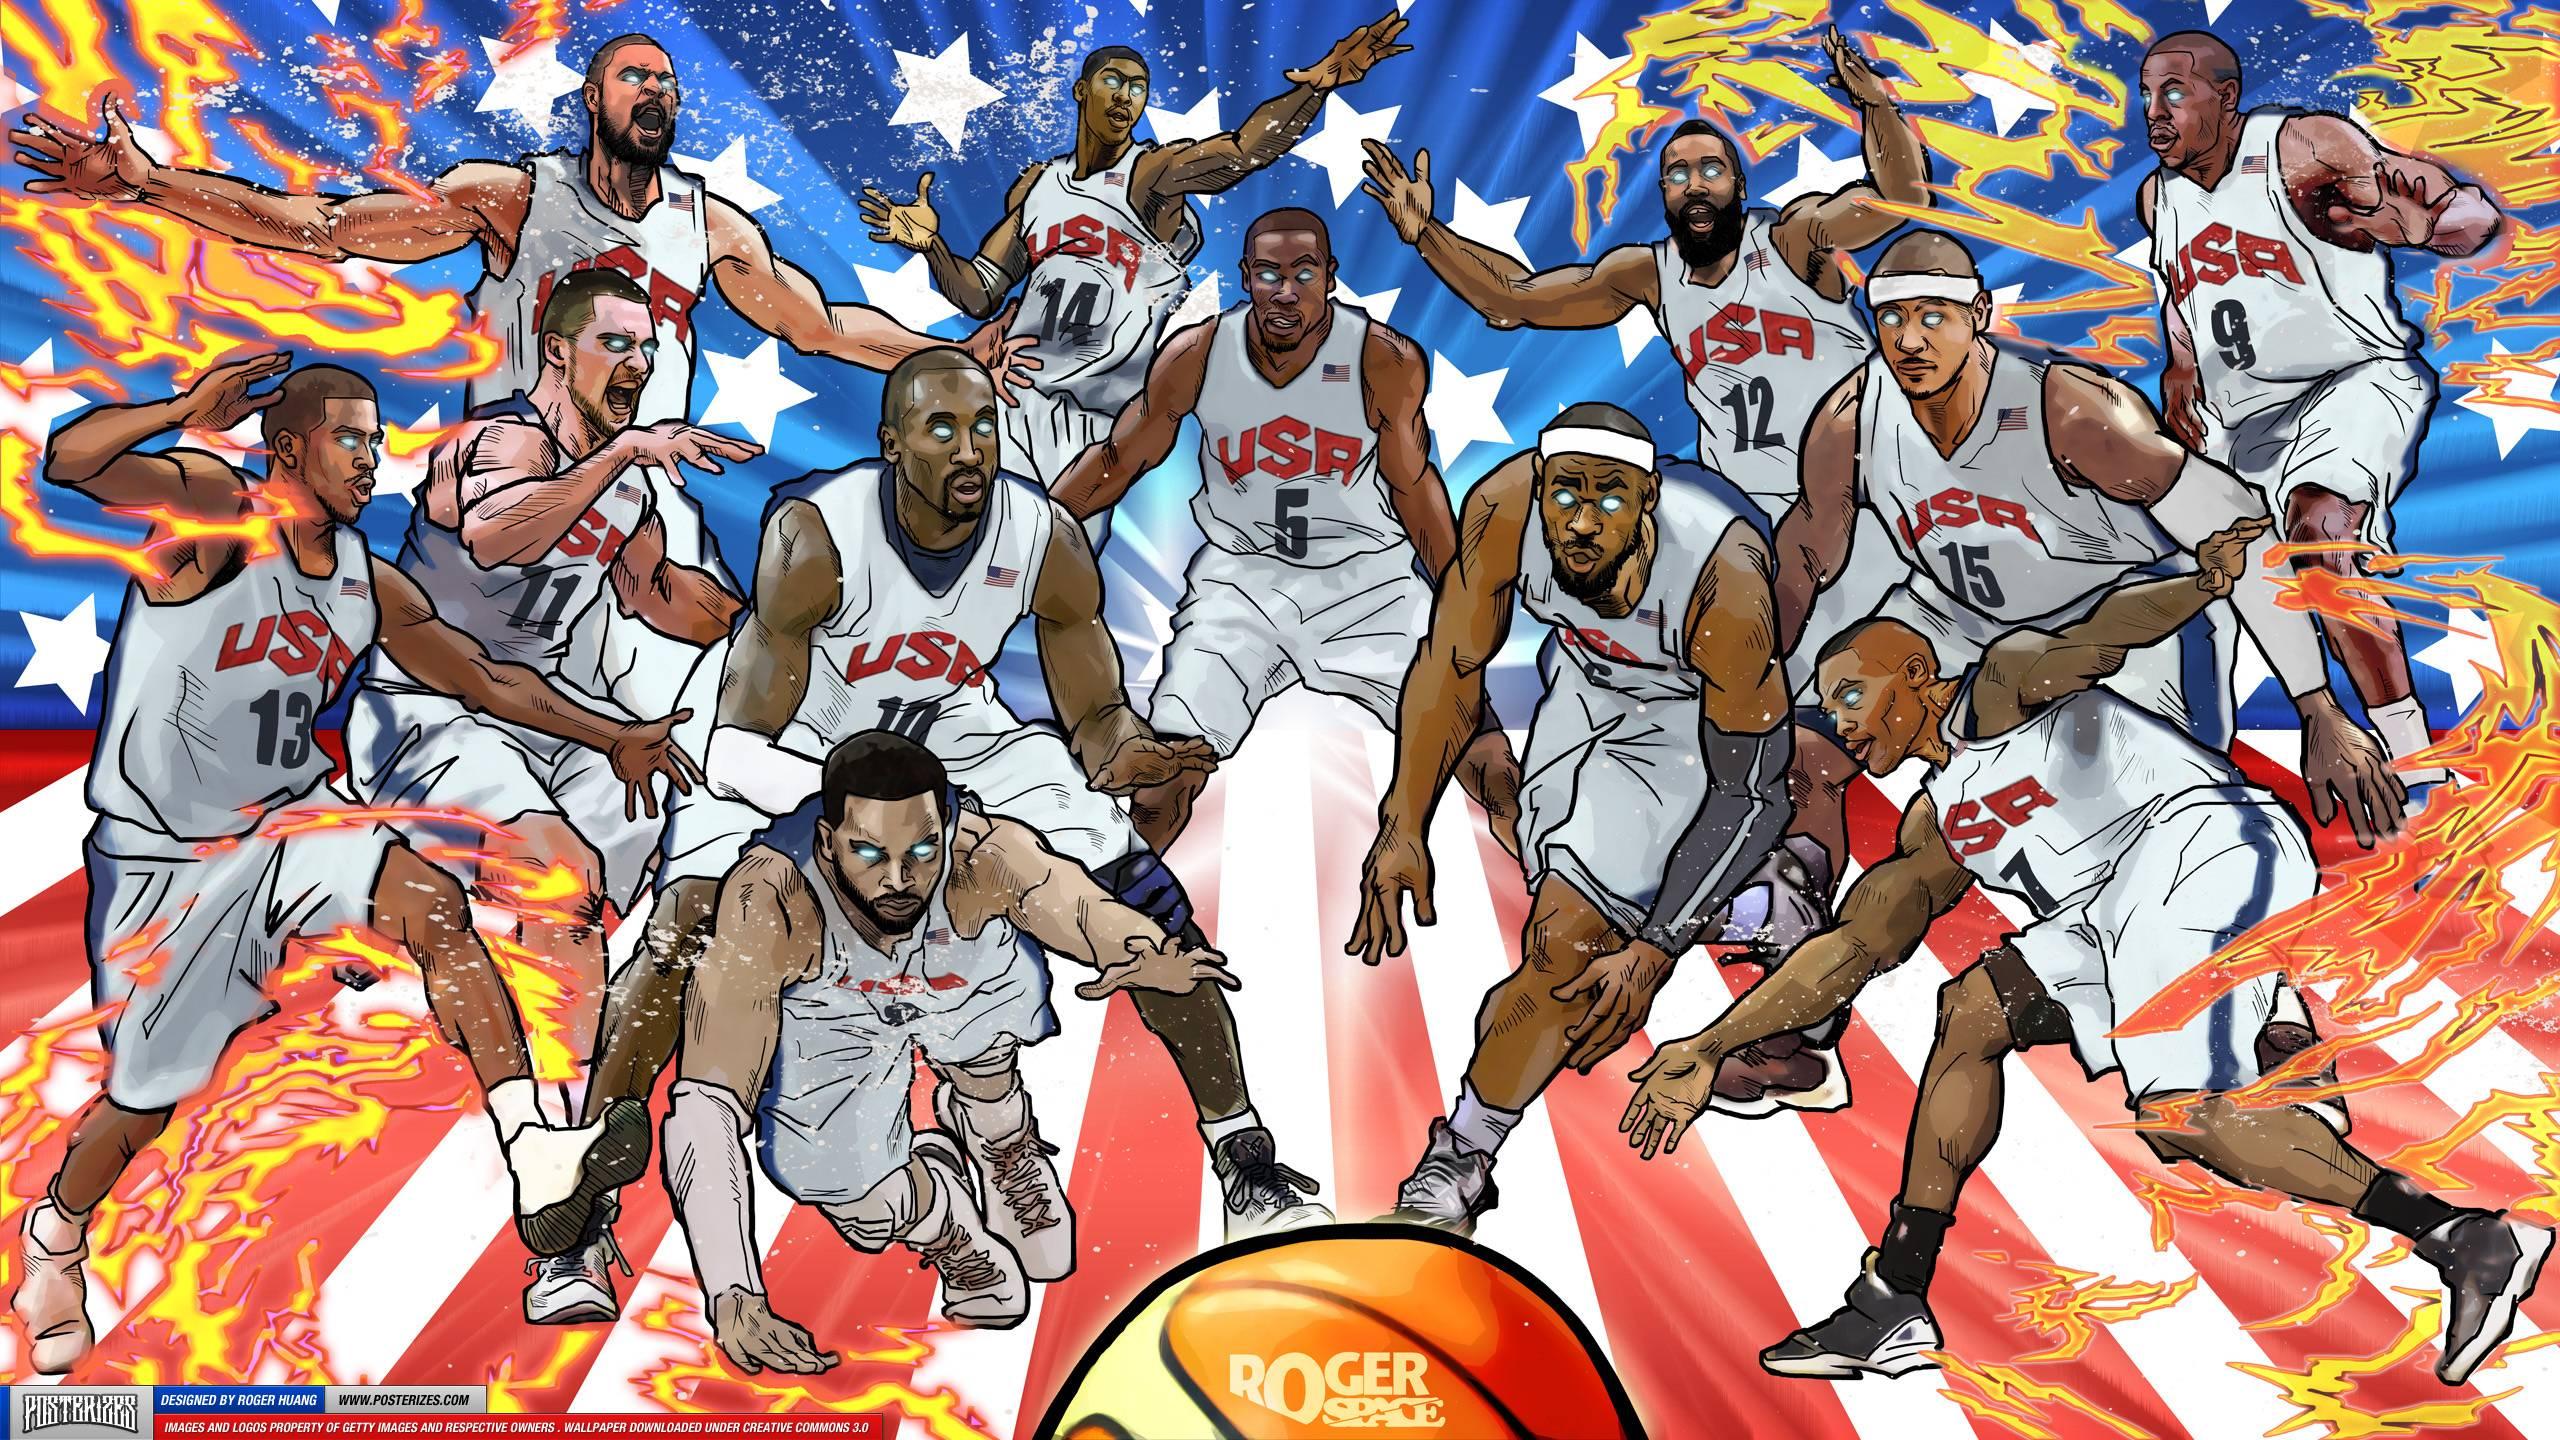 nba basketball wallpapers 2015 wallpaper cave a· download